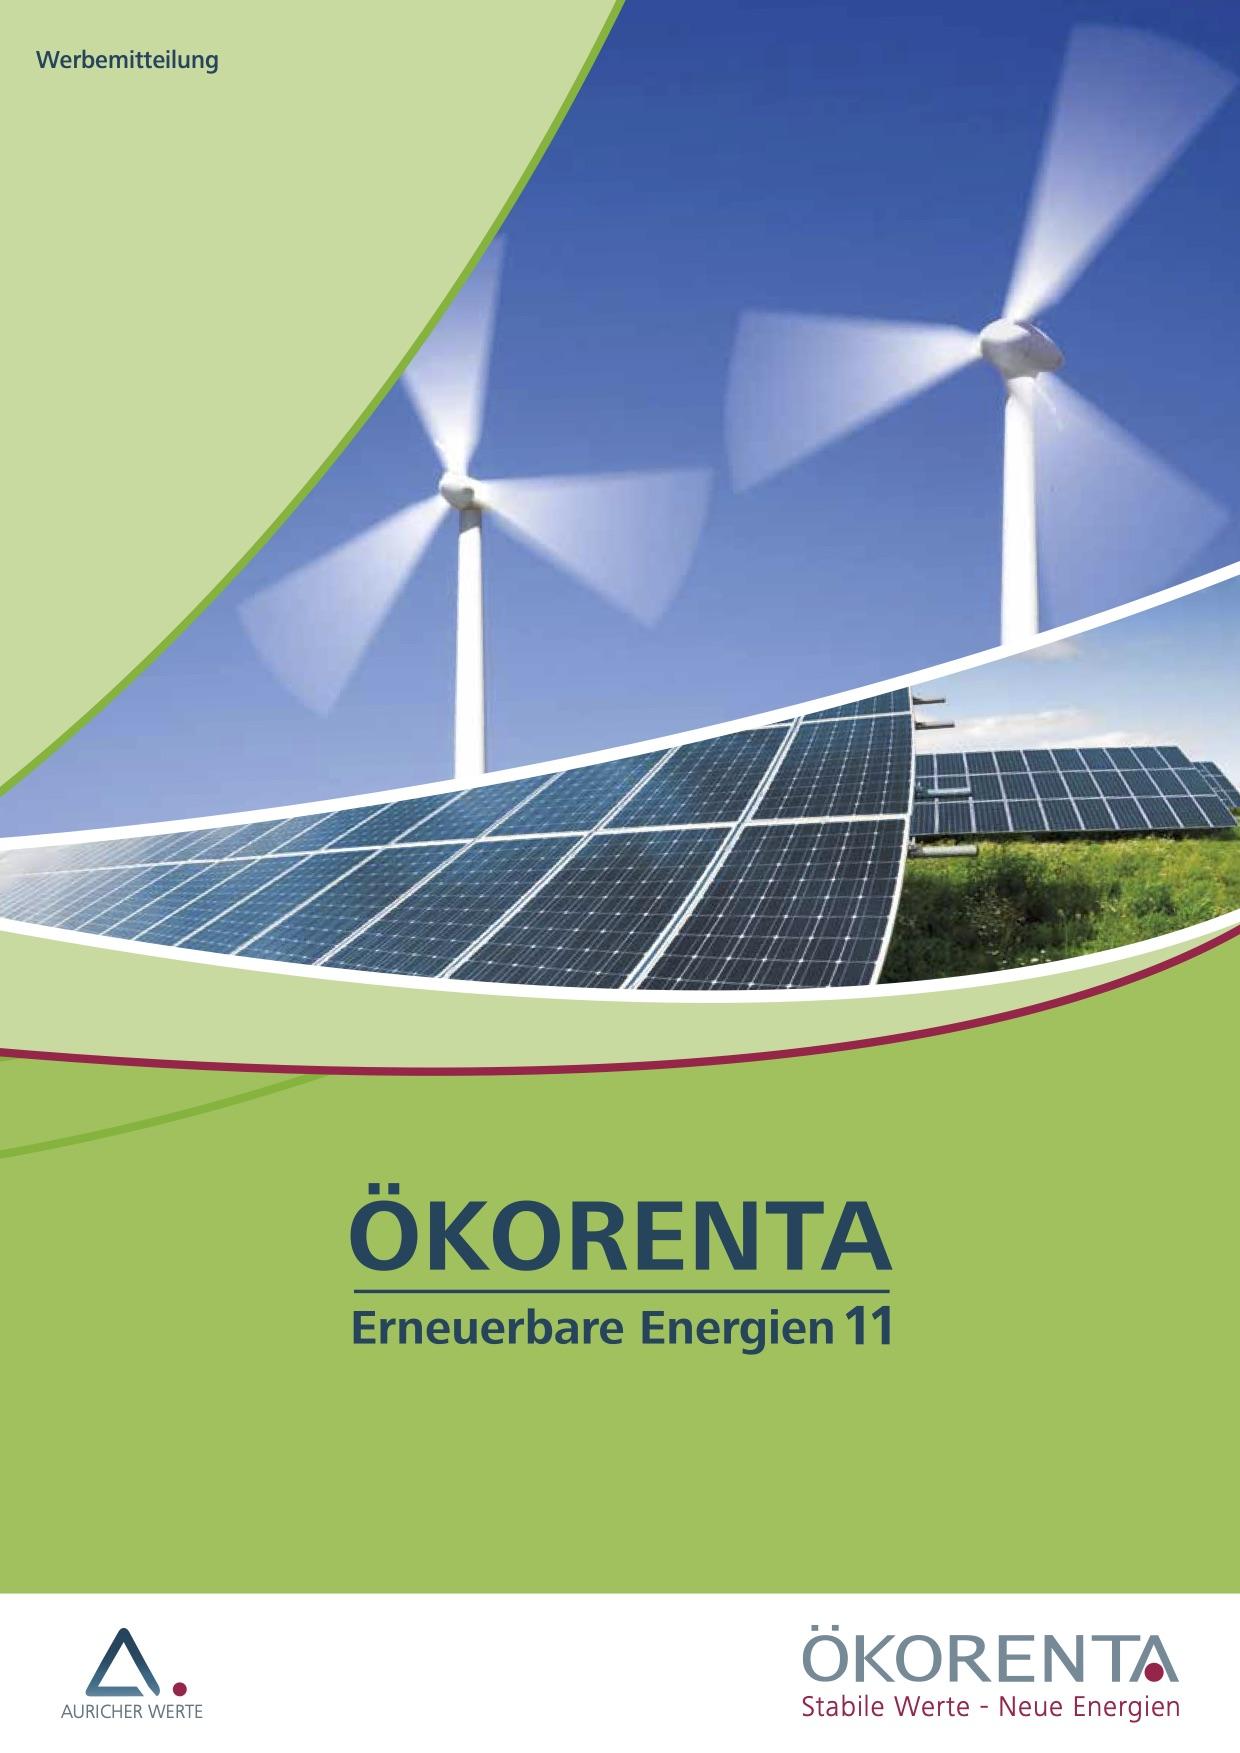 ÖKORENTA Erneuerbare Energien 11